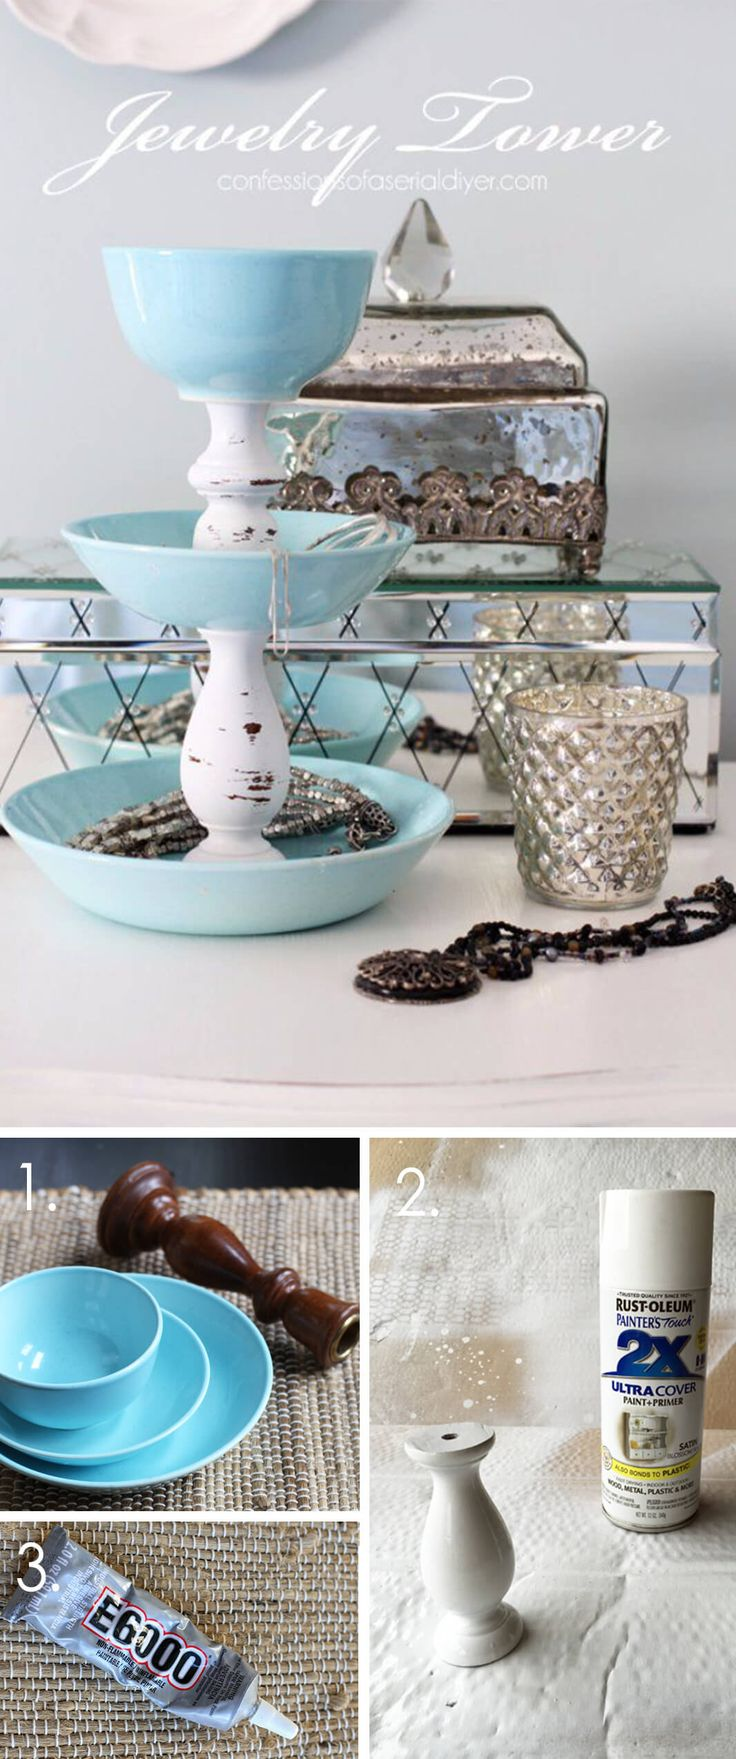 33 Impressive DIY Dollar Store Living ideas for designers on a budget